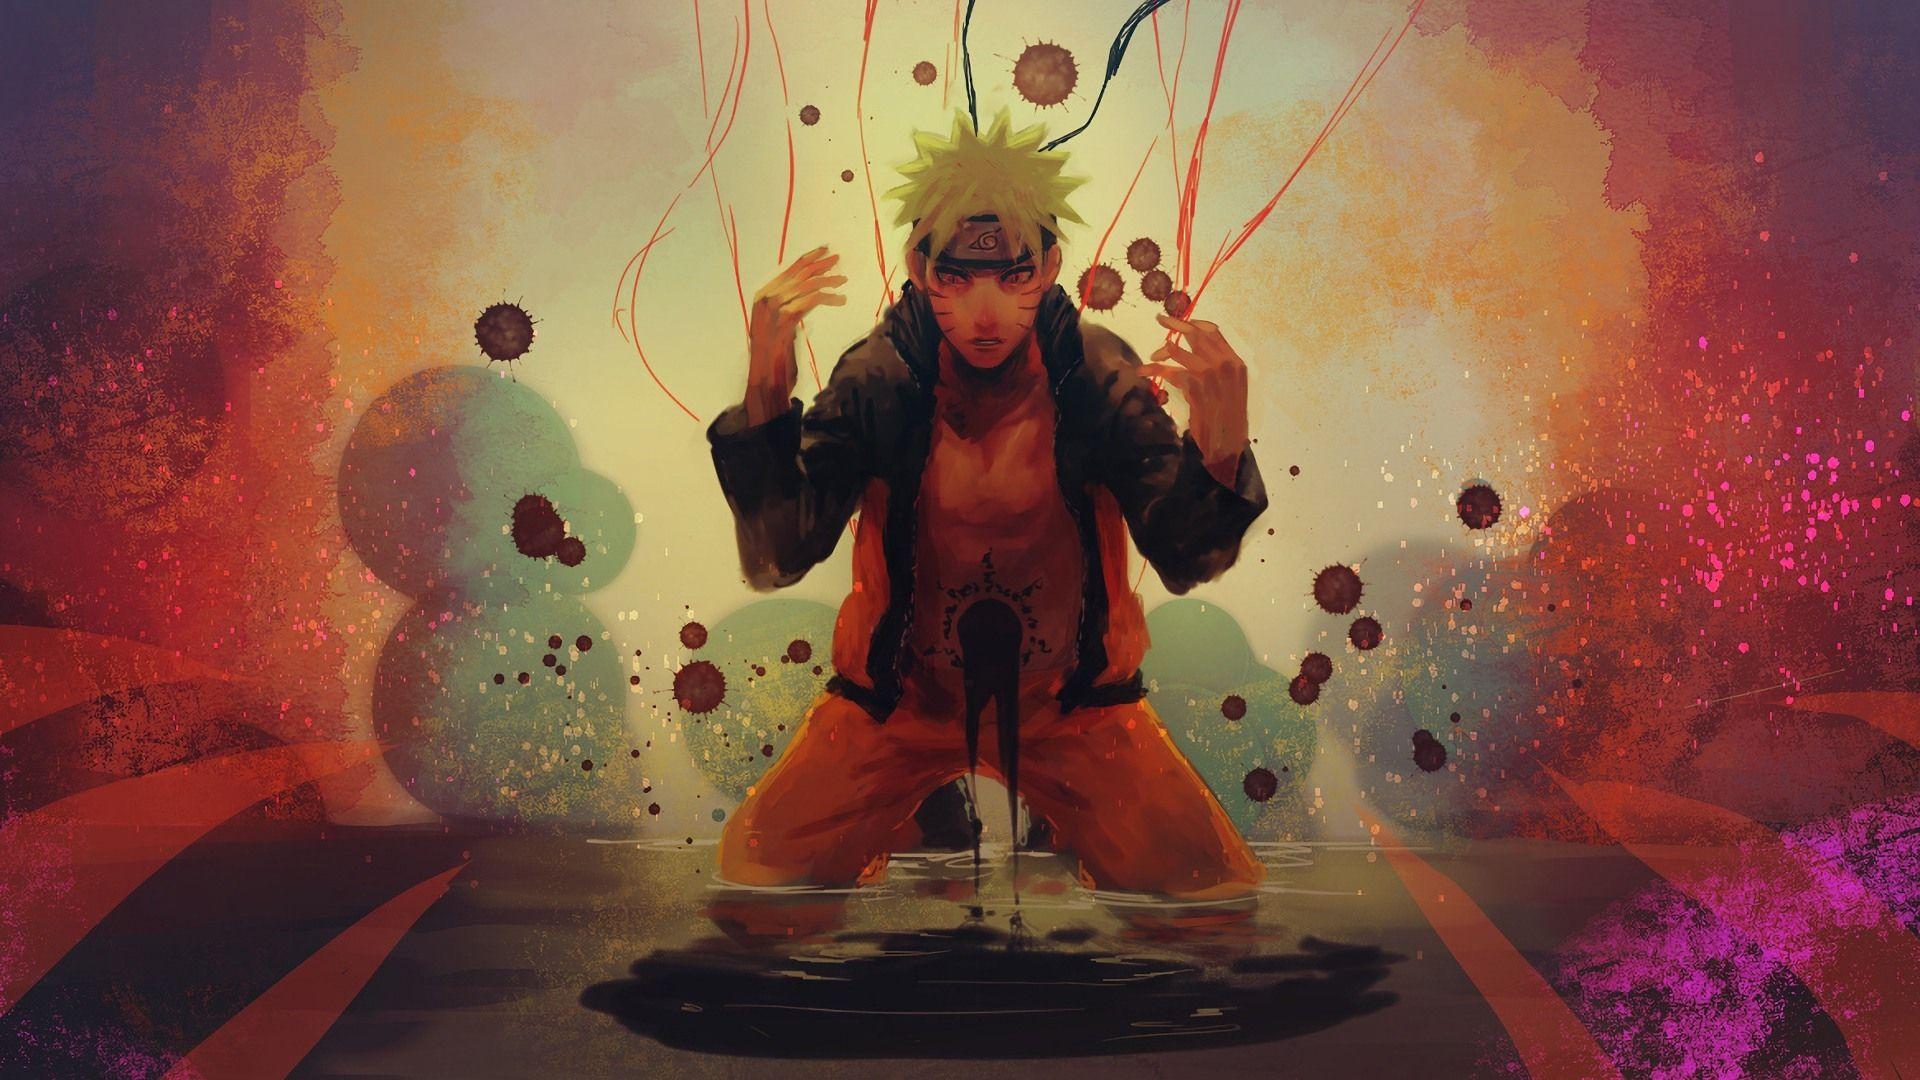 Naruto Art Hd, Wallpaper Theme